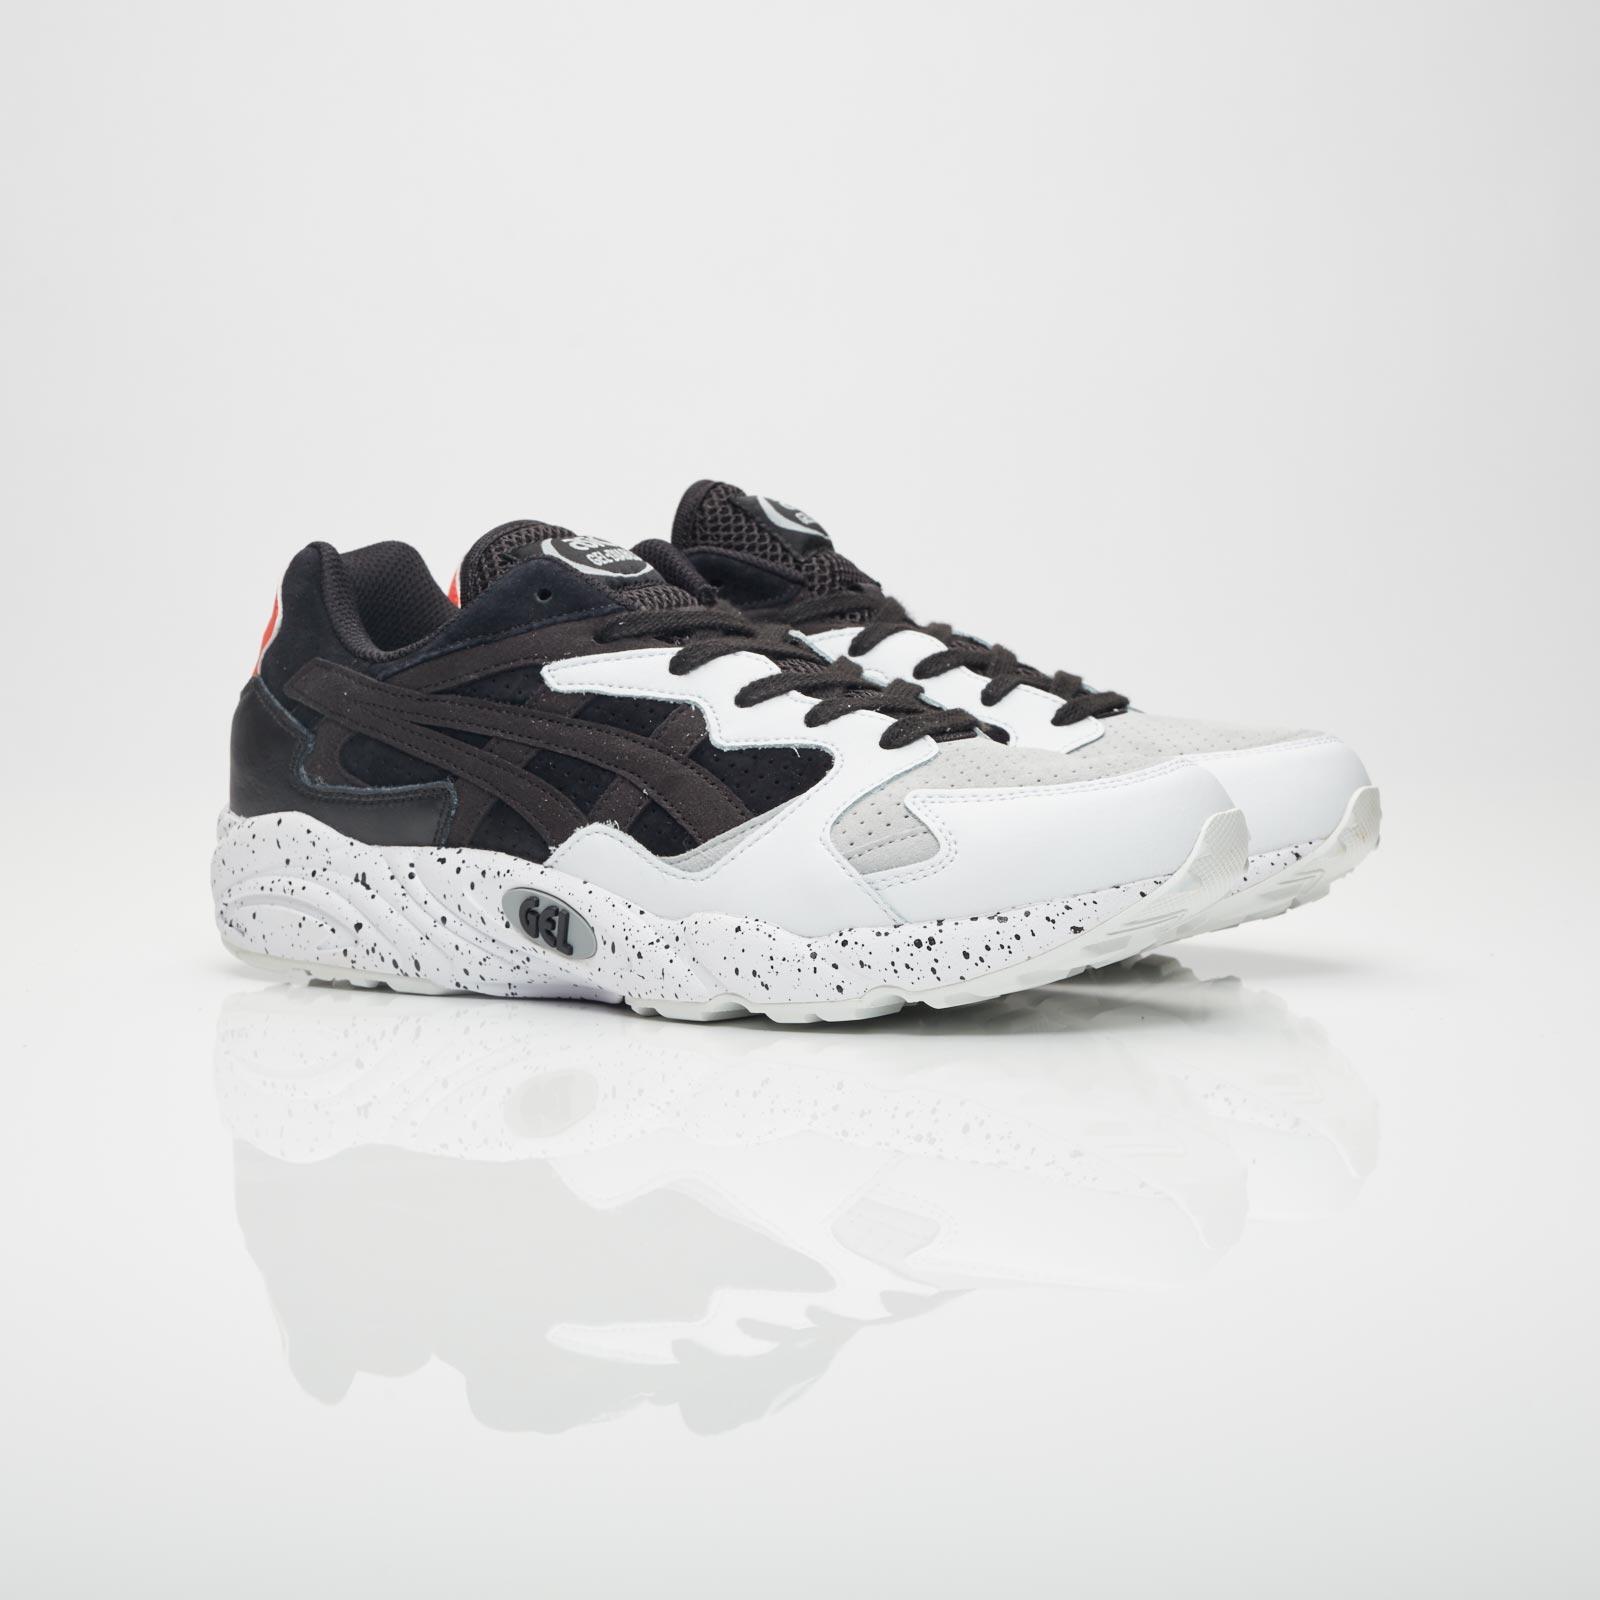 8e0746570ac9 ASICS Tiger Gel-Diablo STR - Hl7y3-9090 - Sneakersnstuff